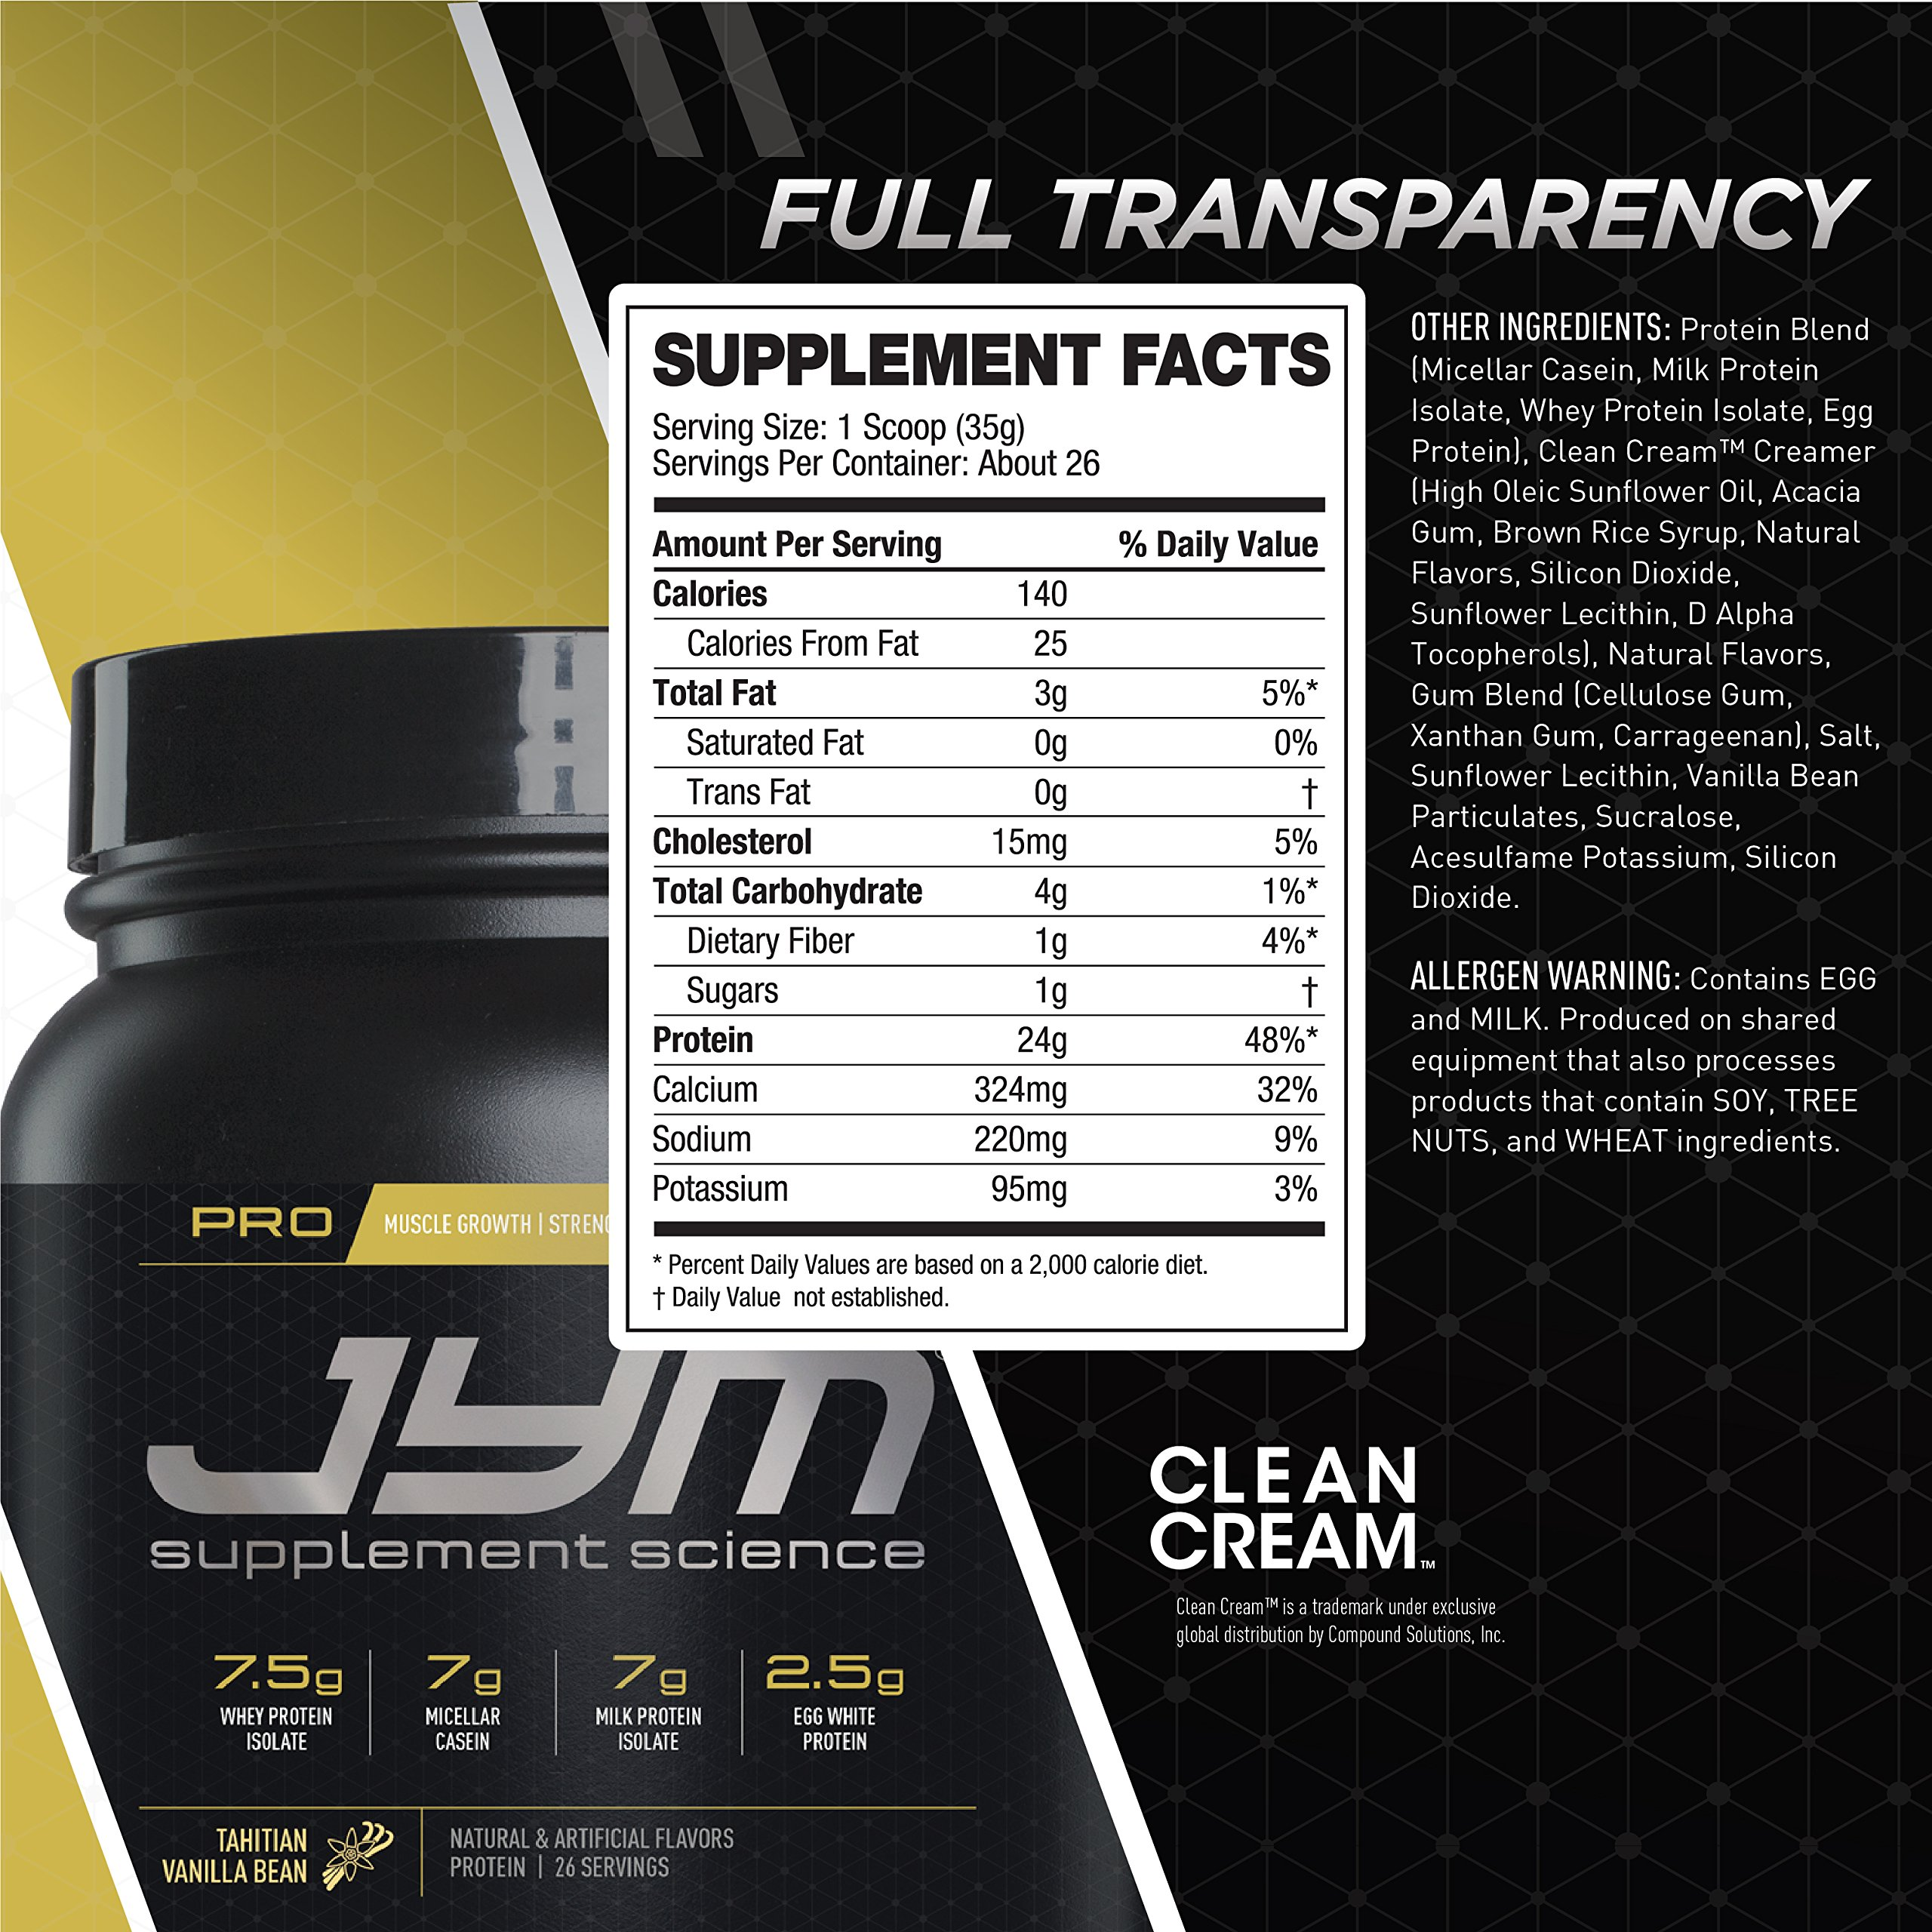 Pro Jym Protein Powder - Egg White, Milk, Whey protein isolates & Micellar Casein   JYM Supplement Science   Tahitian Vanilla Bean Flavor, 4 Lb by JYM Supplement Science (Image #3)